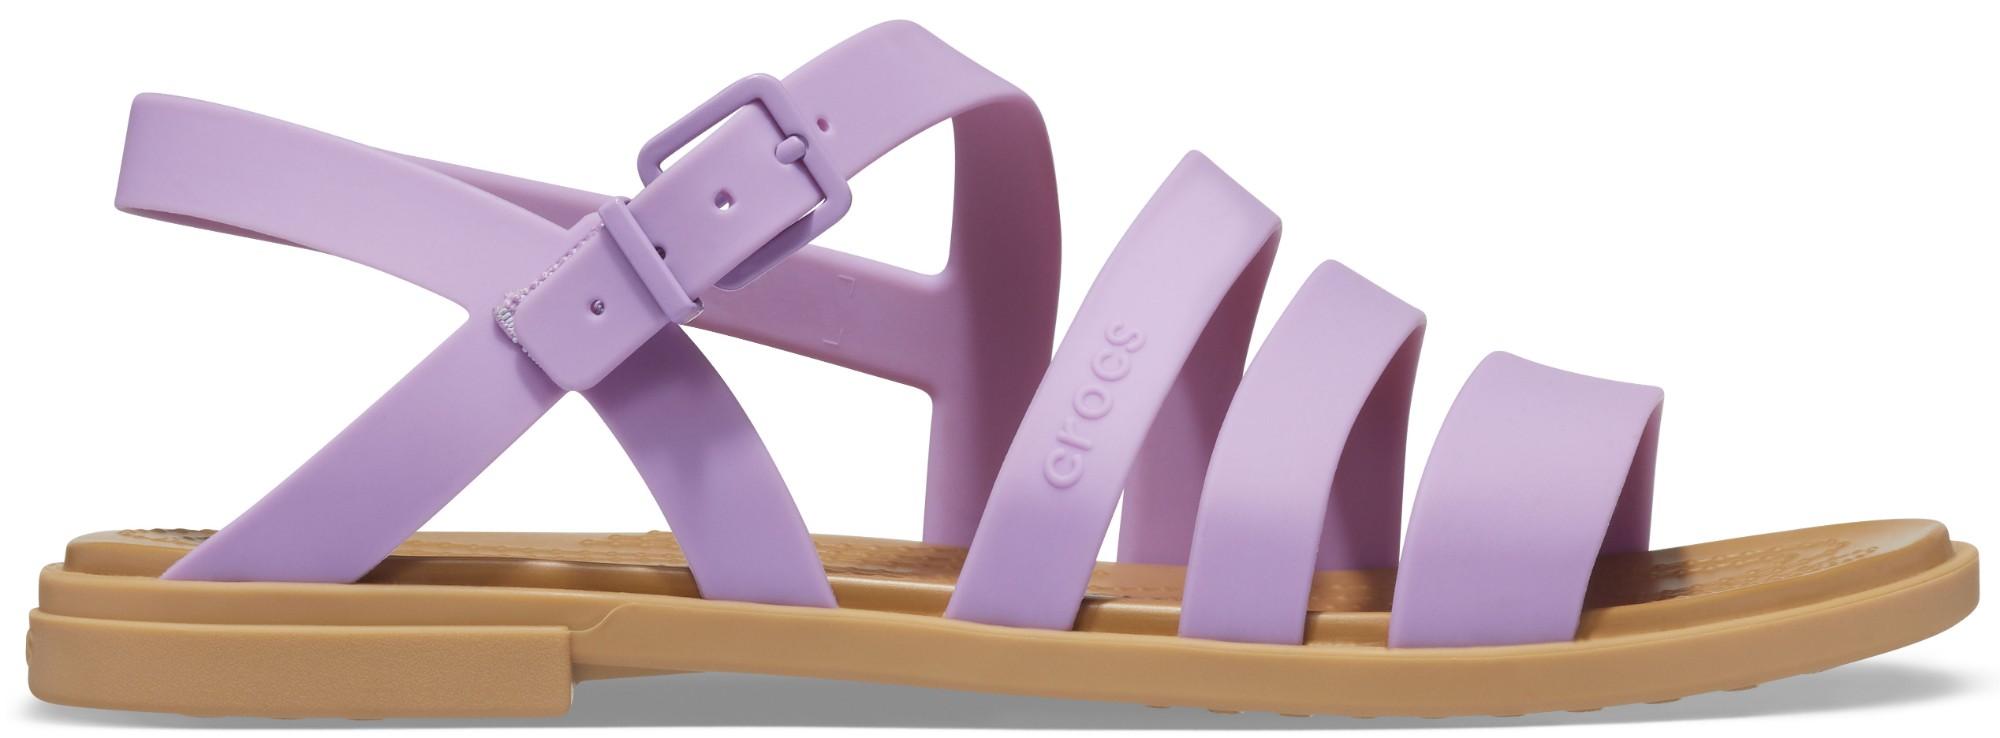 Crocs™ Tulum Sandal Womens Orchid 35